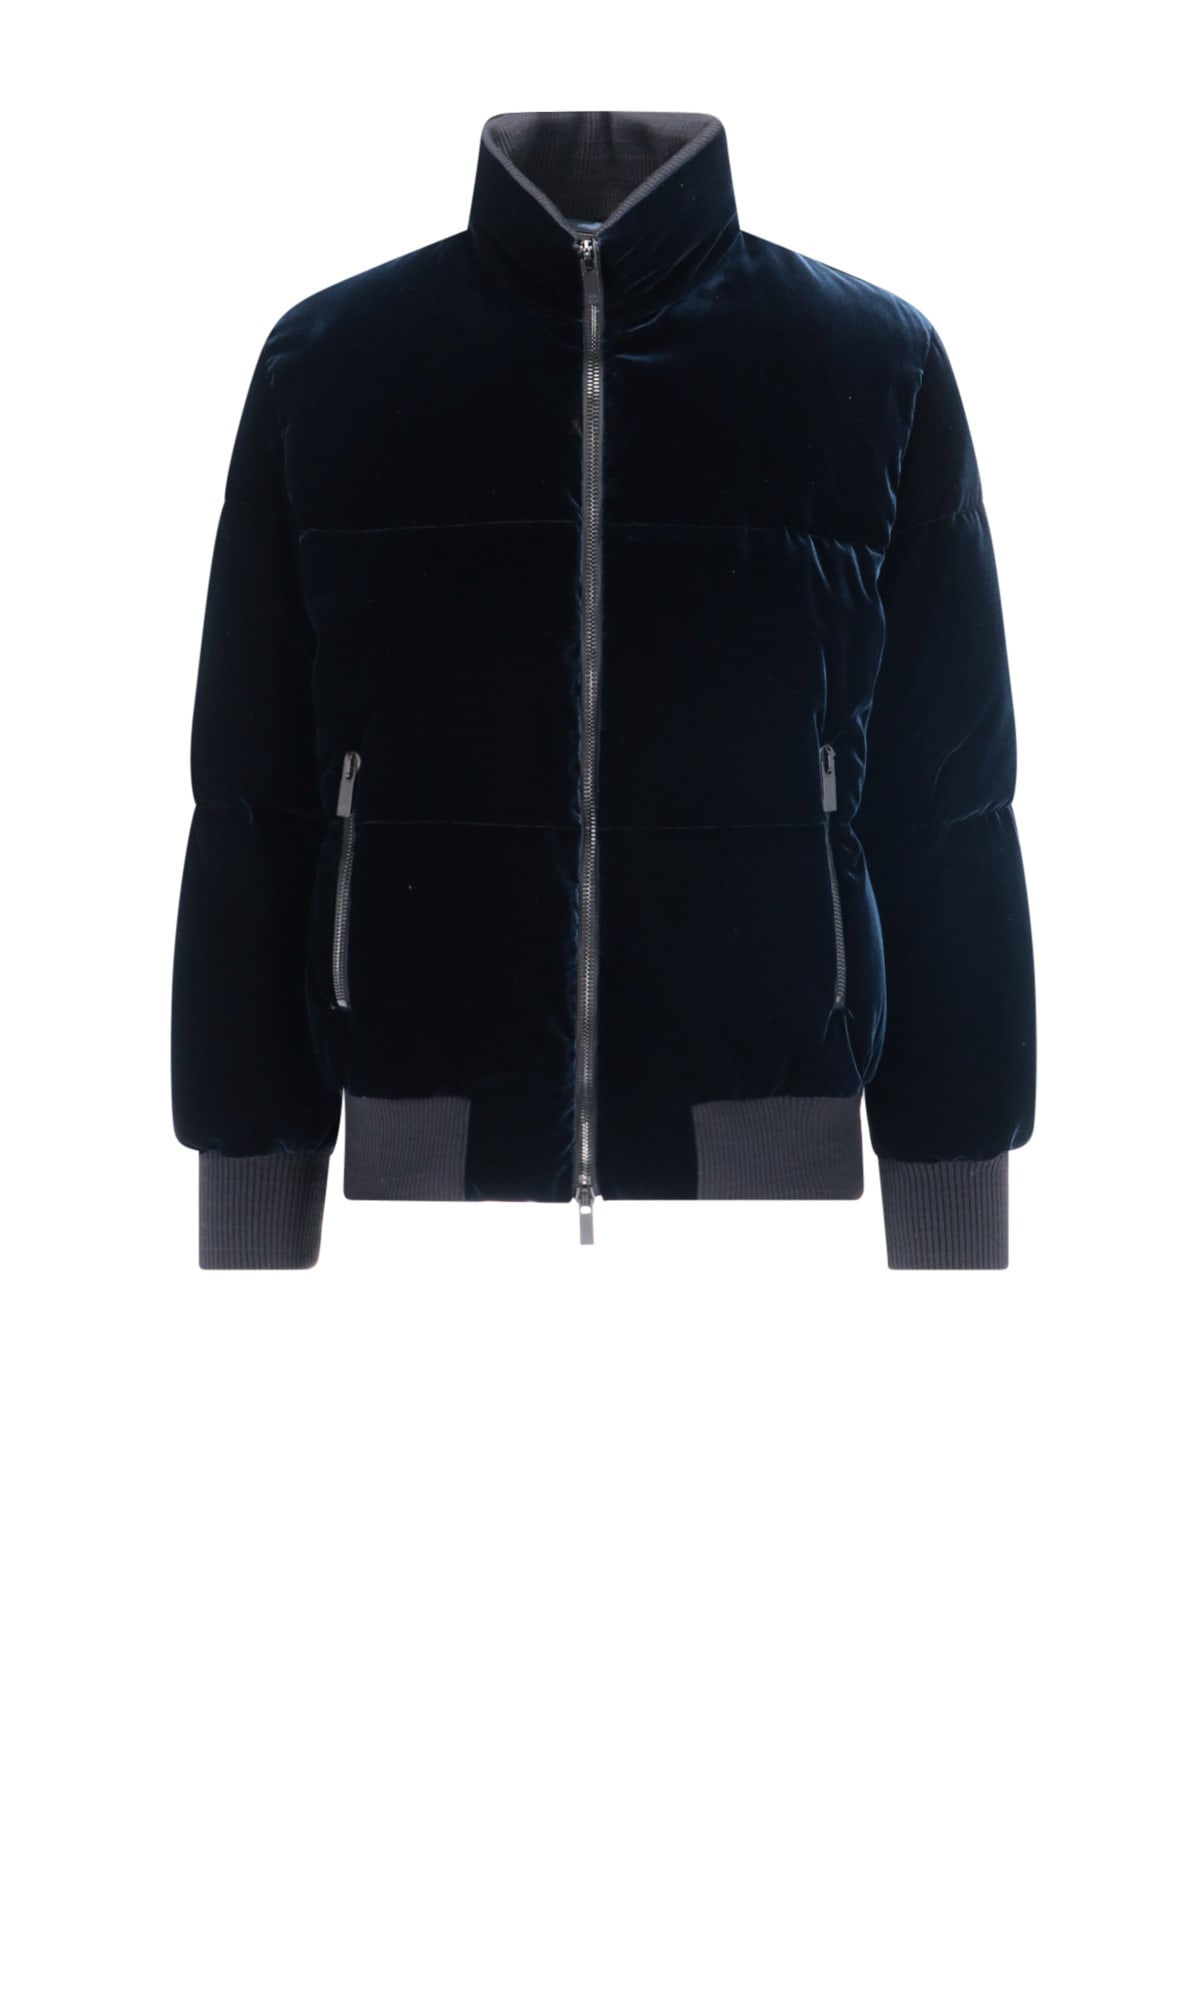 Giorgio Armani Jacket In Blue